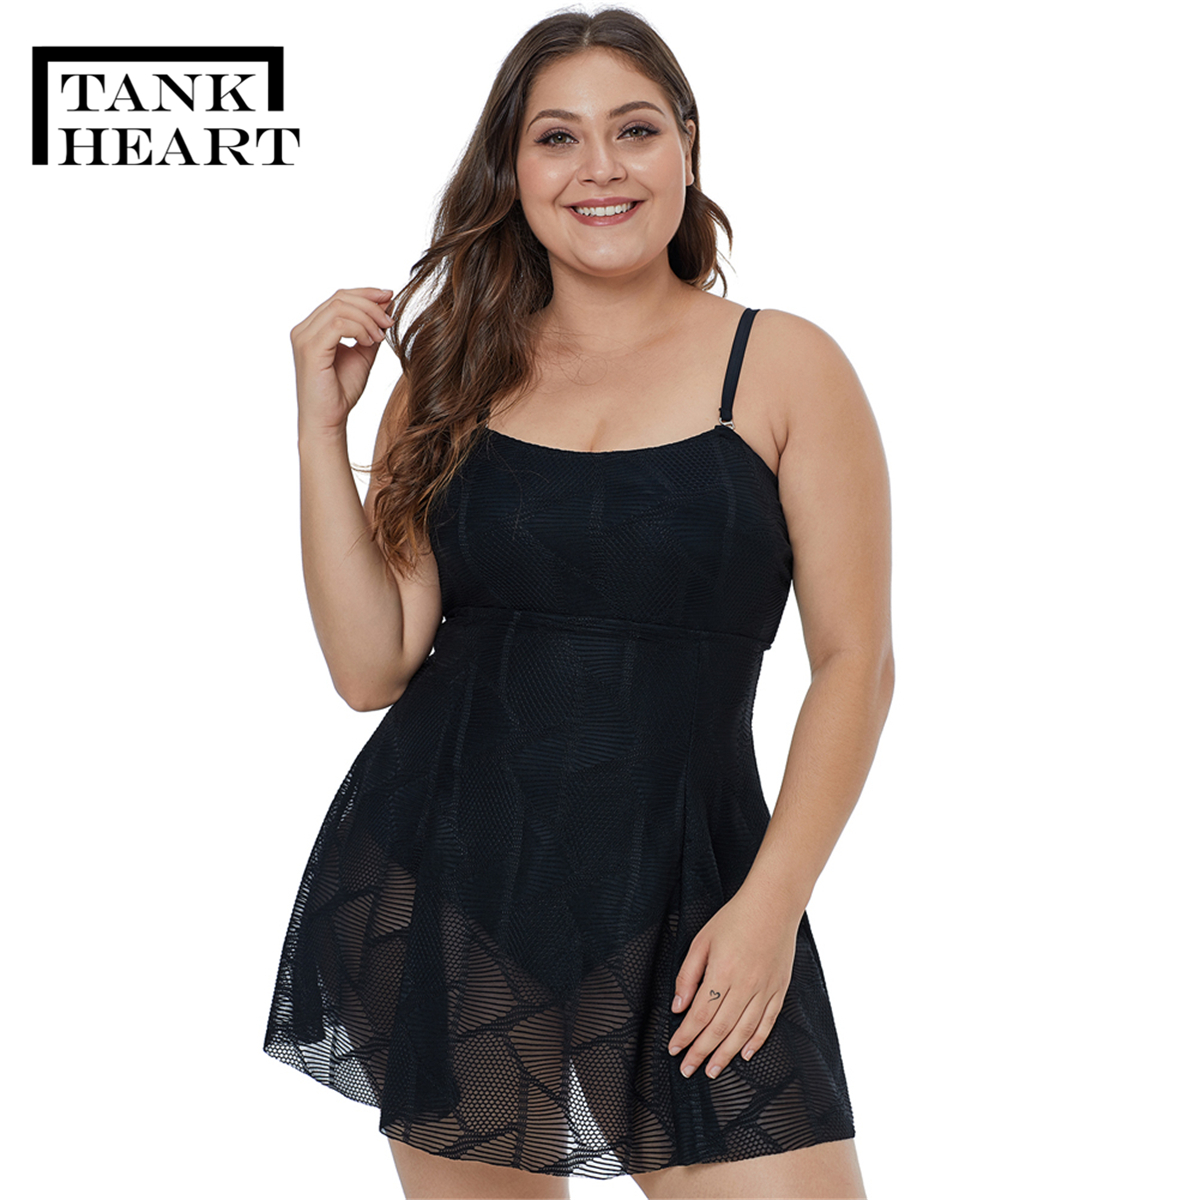 Top SaleSwimwear Women Skirt Bikini Mush Black Bathsuit Plus-Size XXXL Sexy